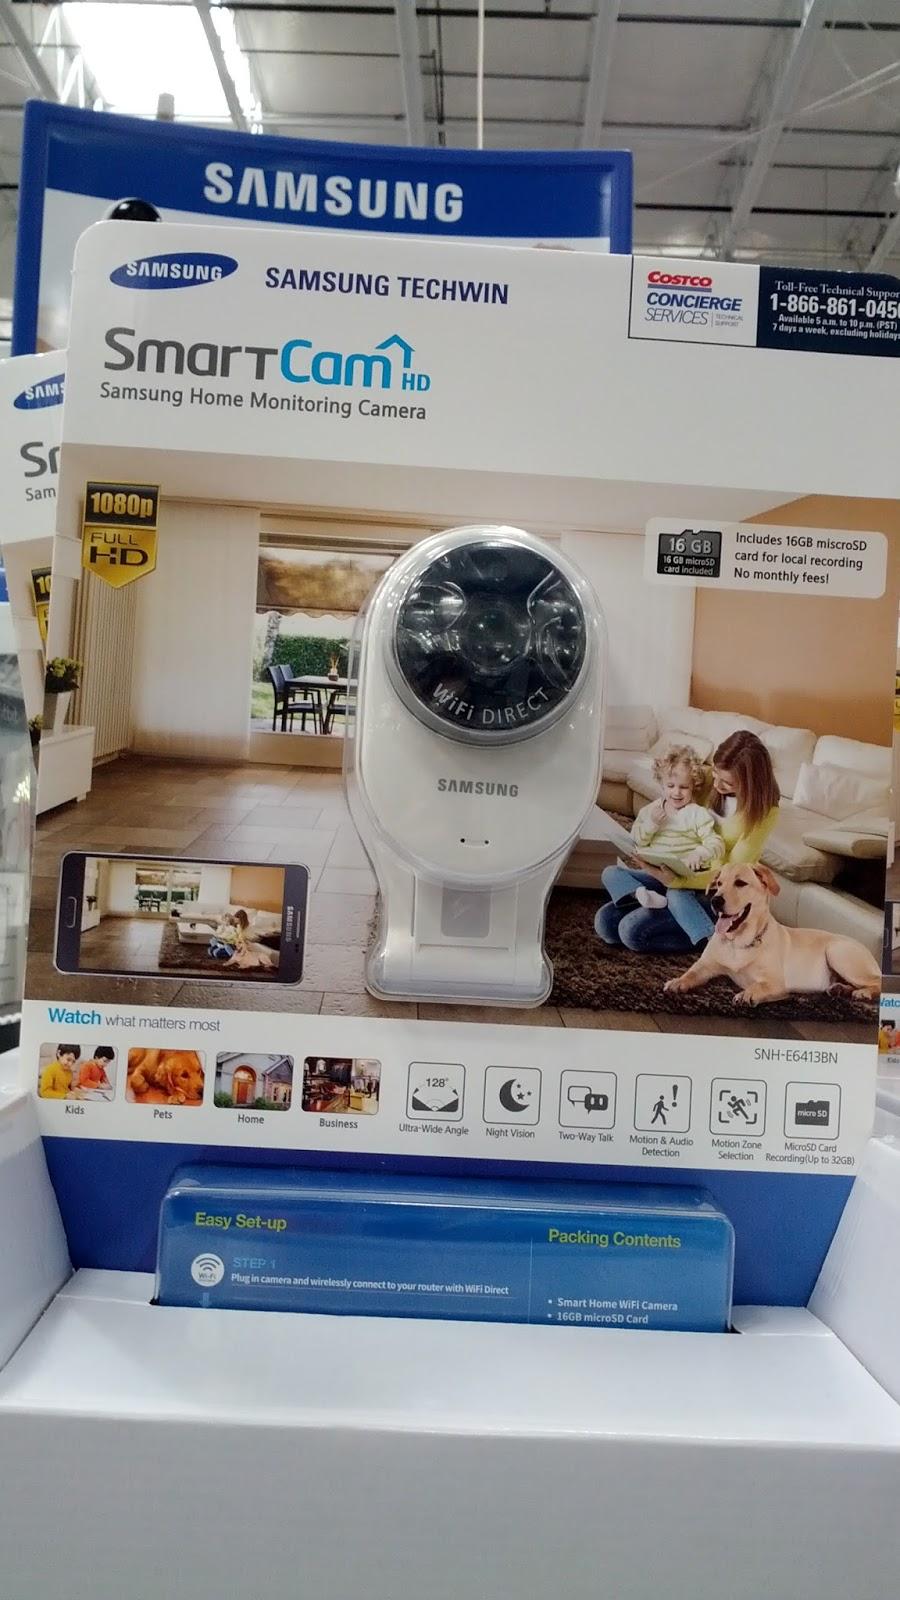 Samsung Smartcam 1080p Hd Home Monitoring Surveillance